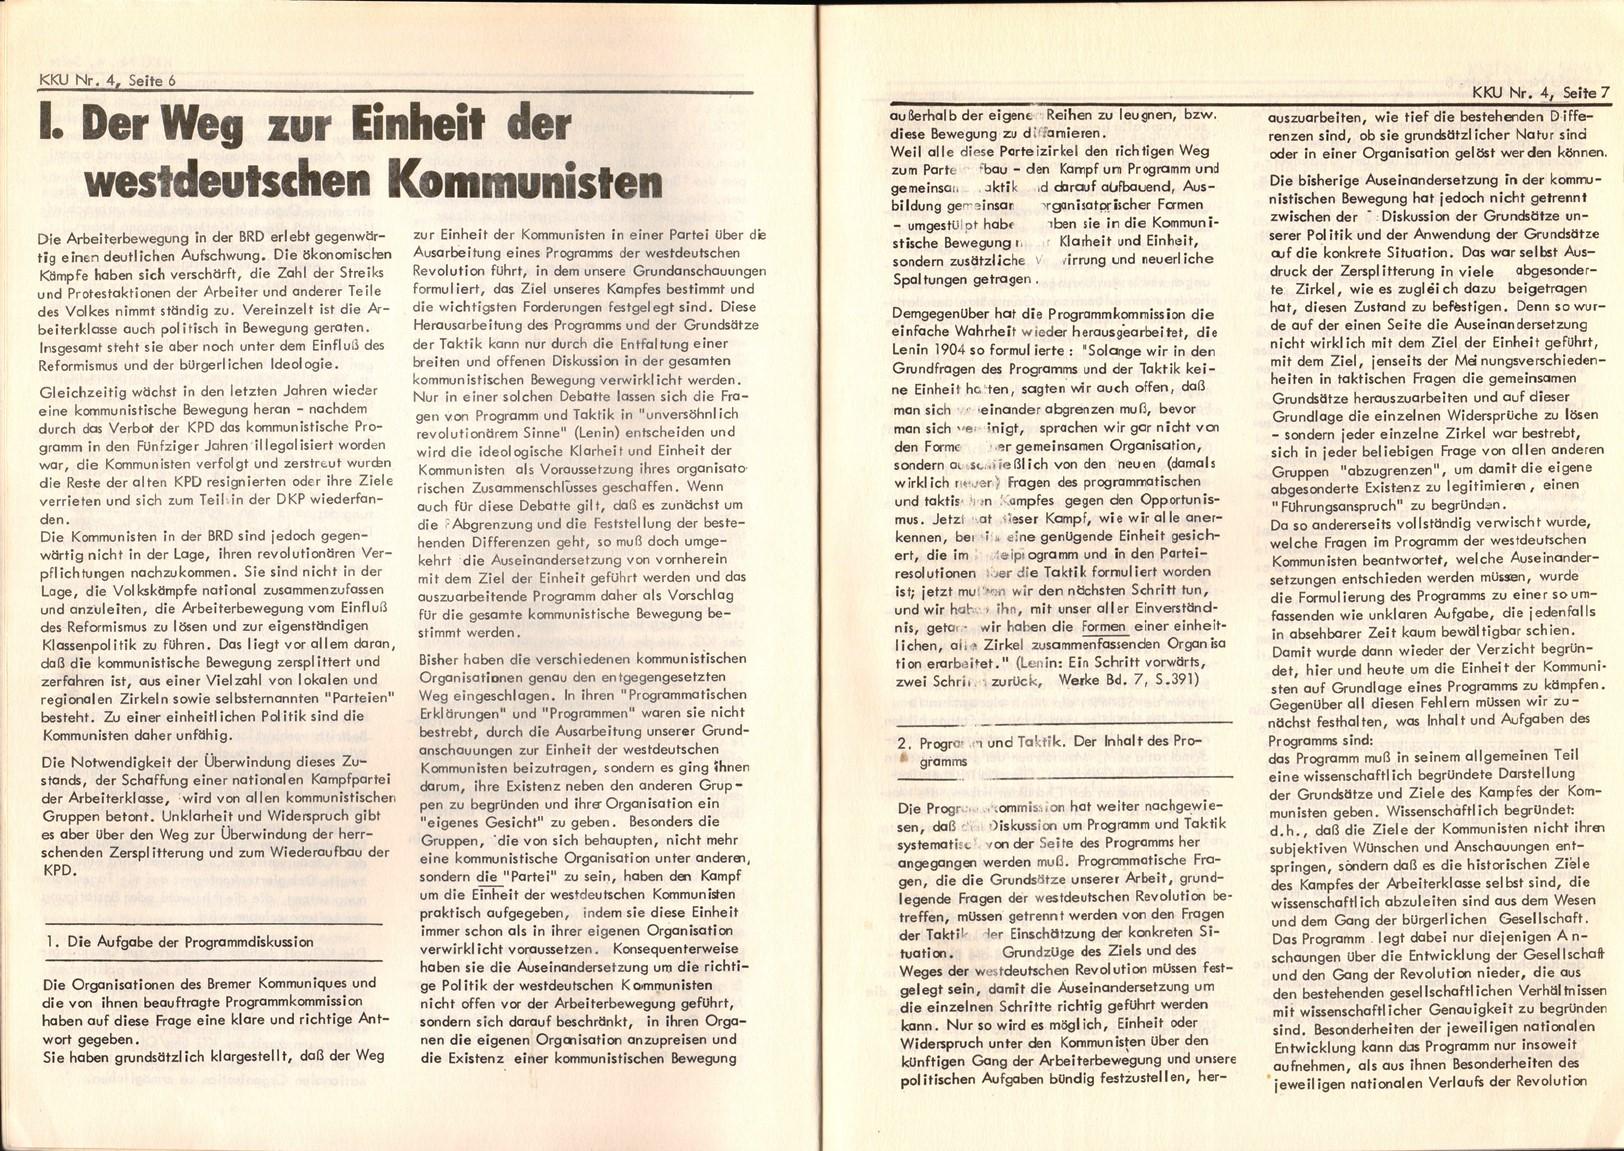 Frankfurt_Offenbach_KG_Kampf_Kritik_Umgestaltung_1973_04_05_04